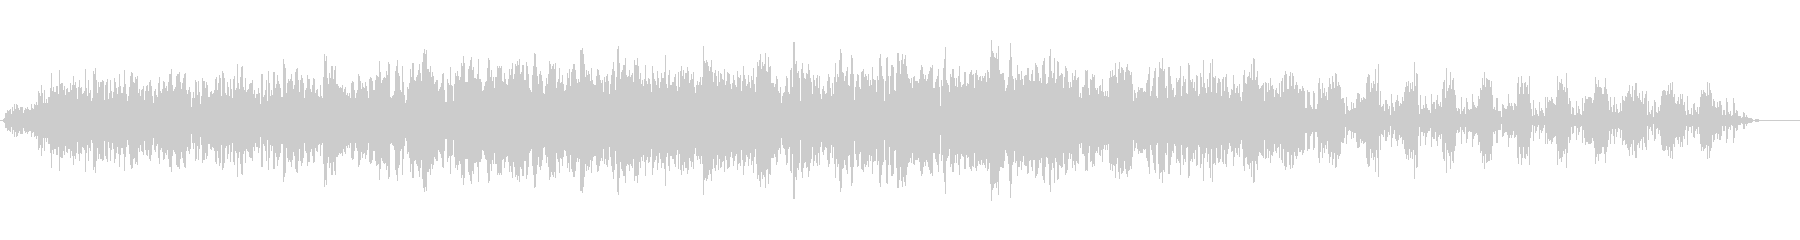 SciFi EC01_84_1の未再生の波形